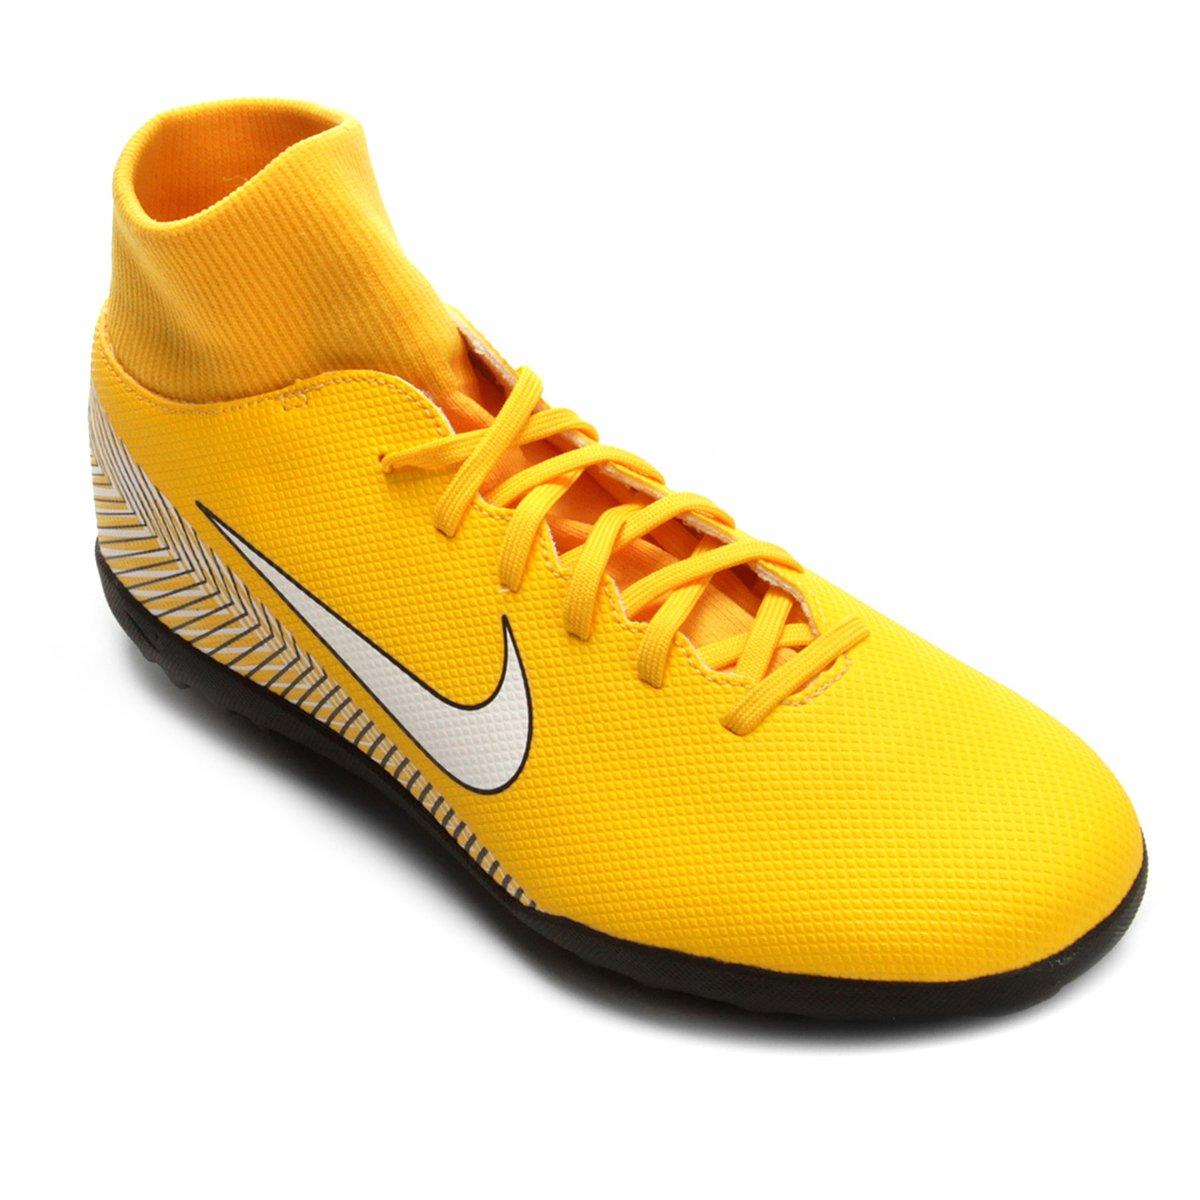 bf8c6ee499 Chuteira Society Nike Mercurial Superfly 6 Club Neymar - Amarelo e Preto